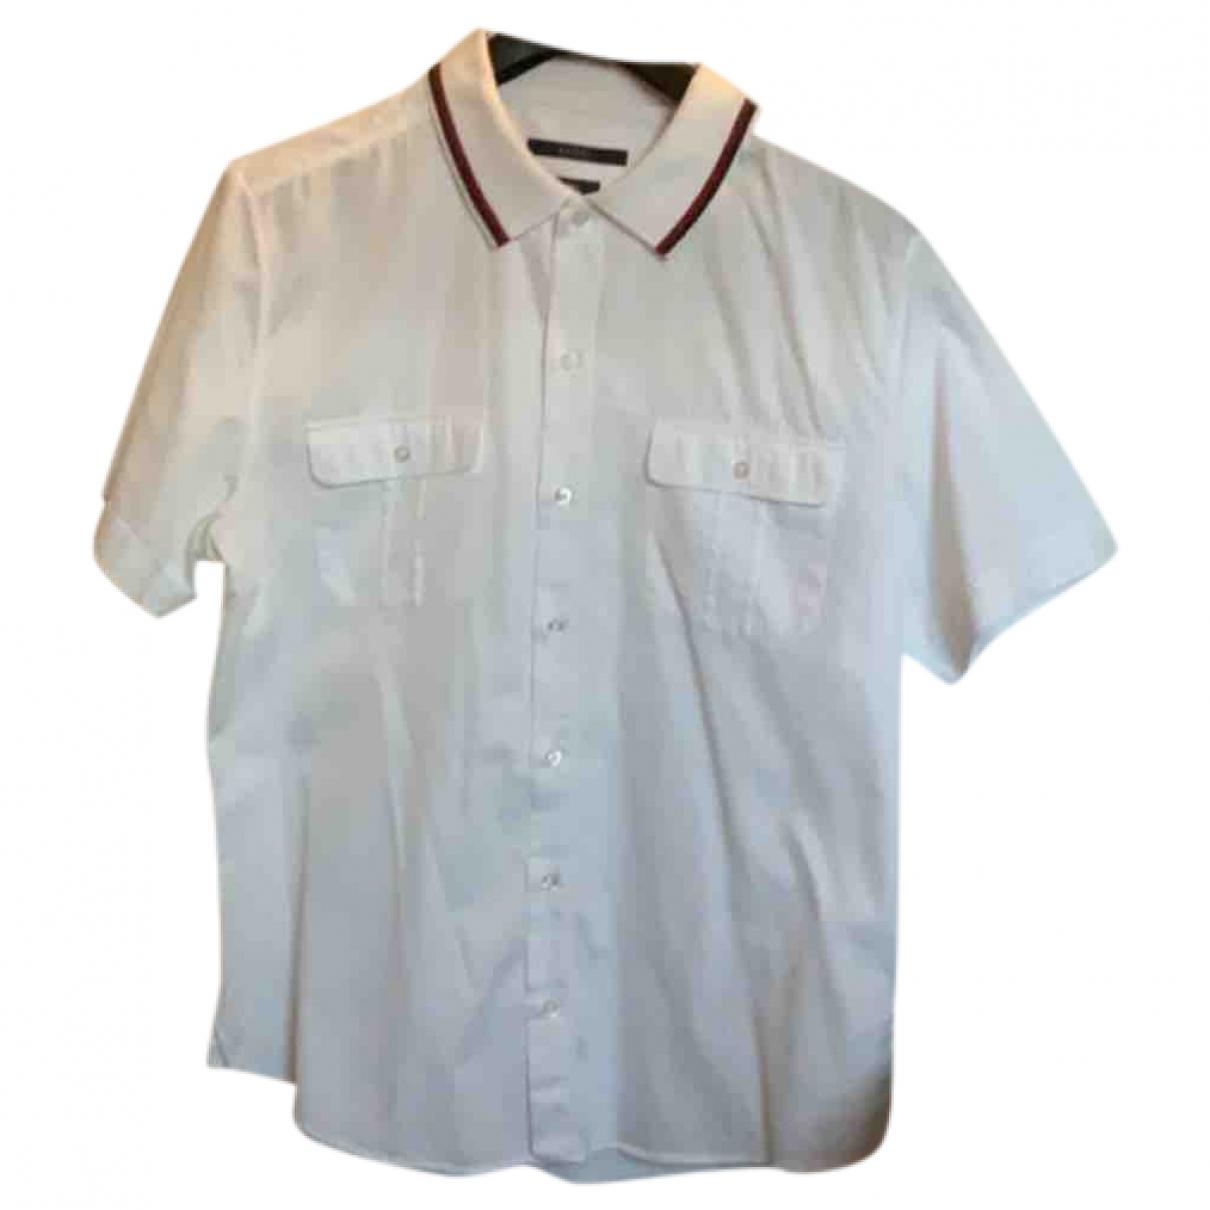 Camisas Gucci